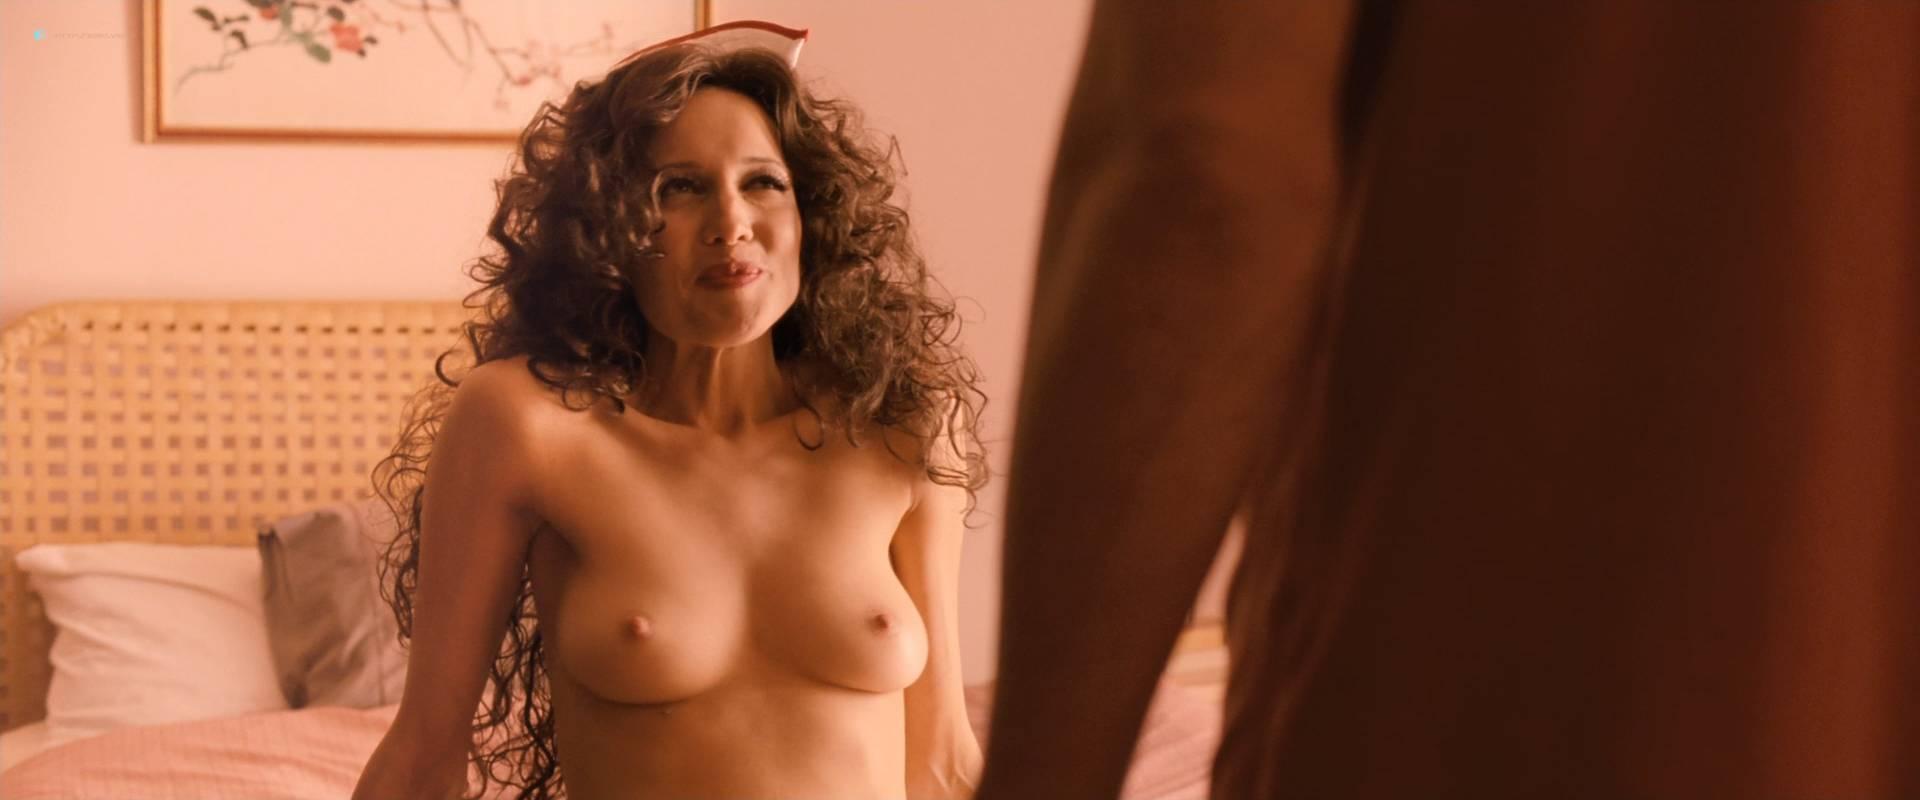 Nude kim kardashian uncensored